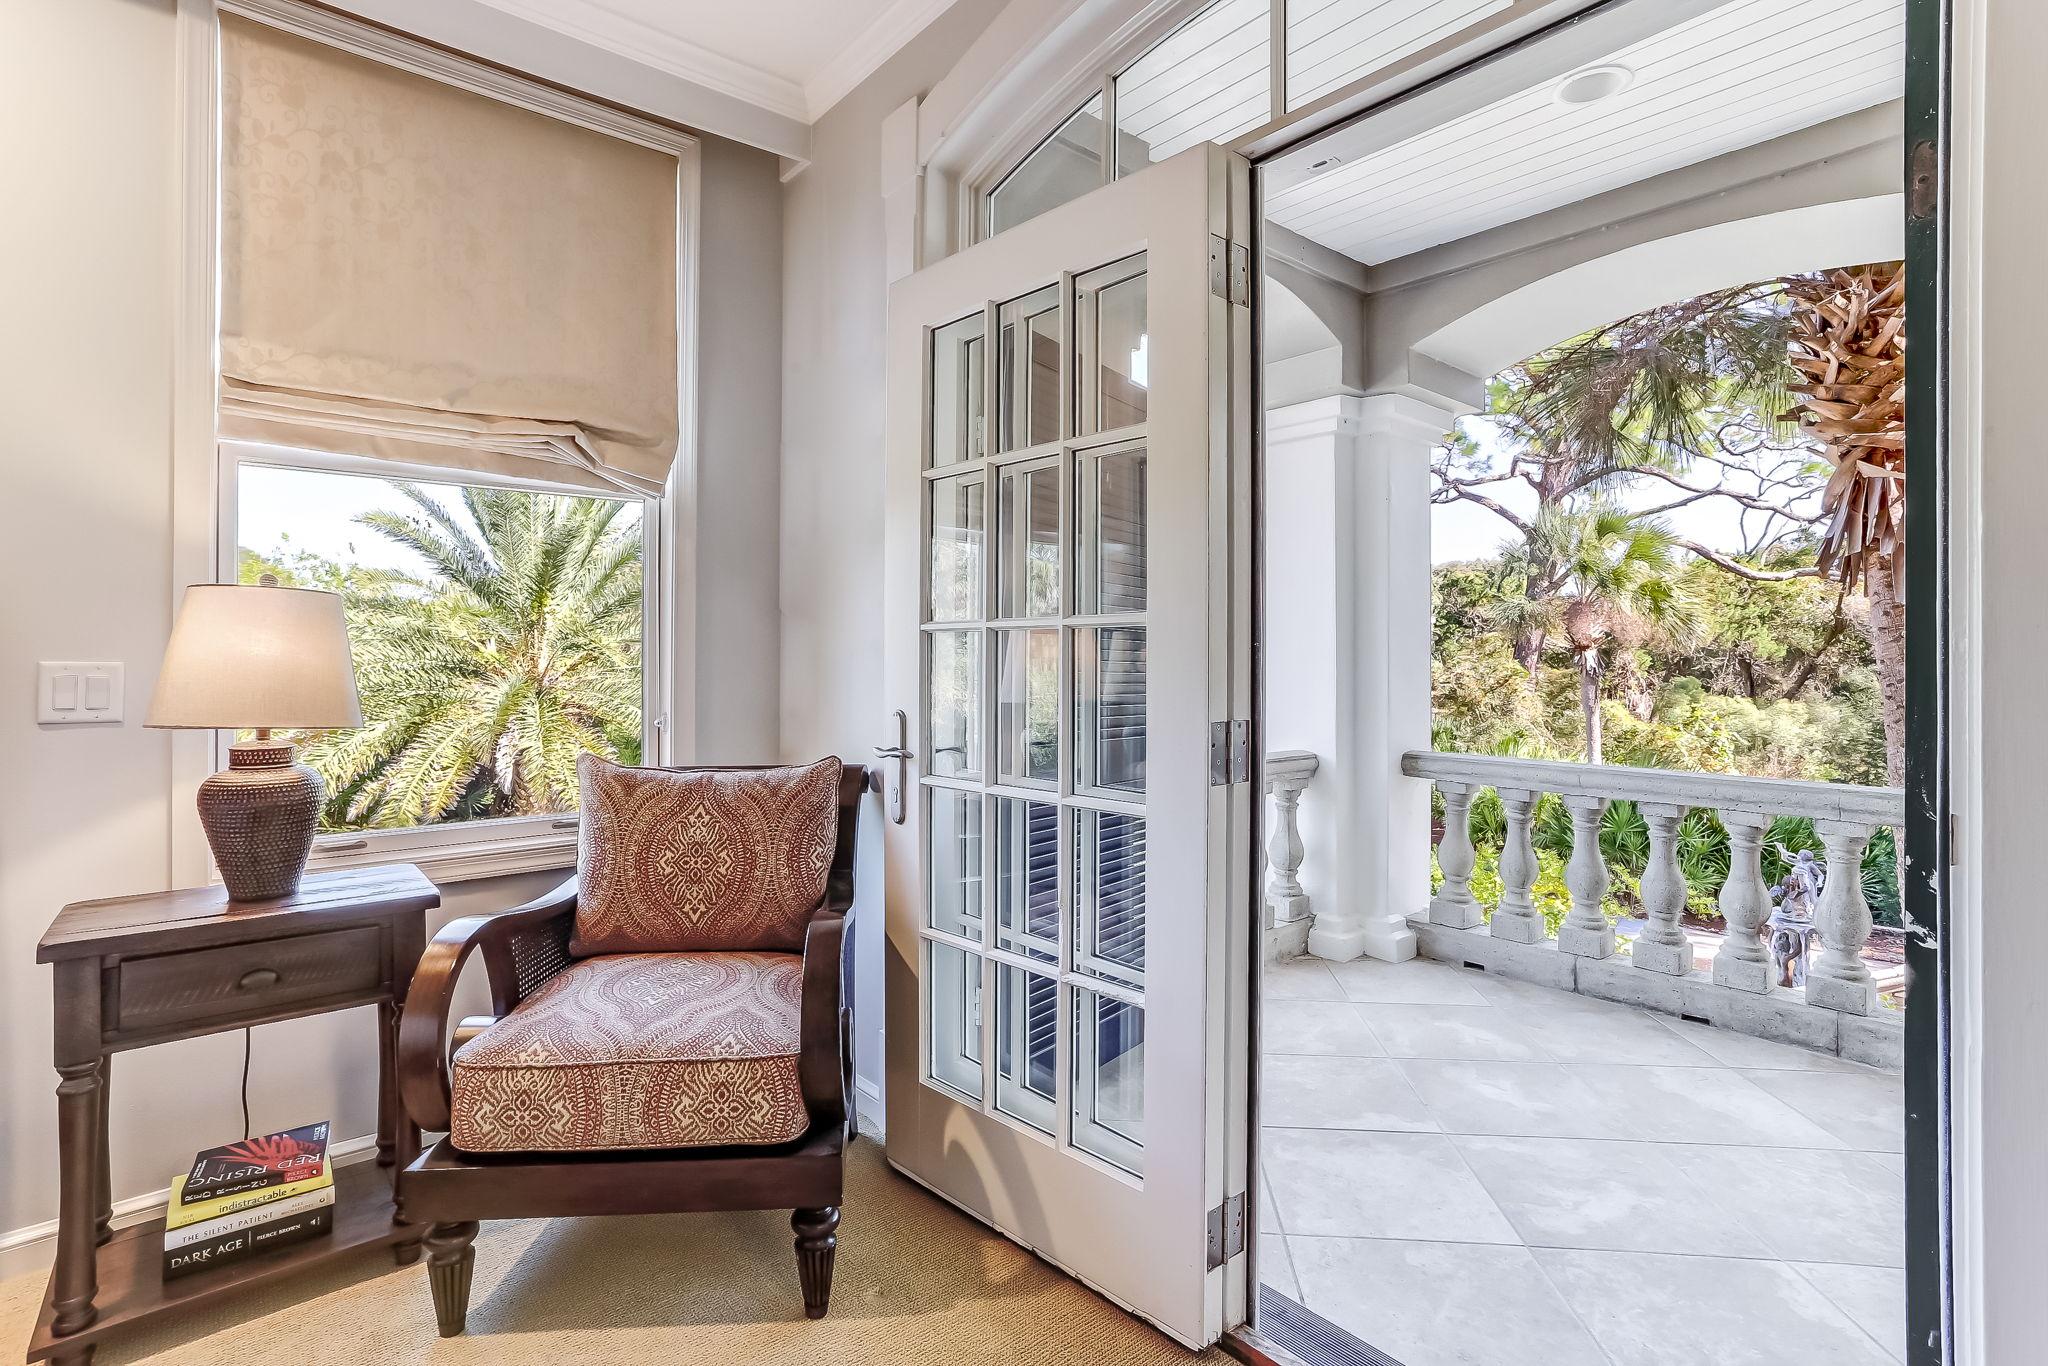 Bedroom to Porch